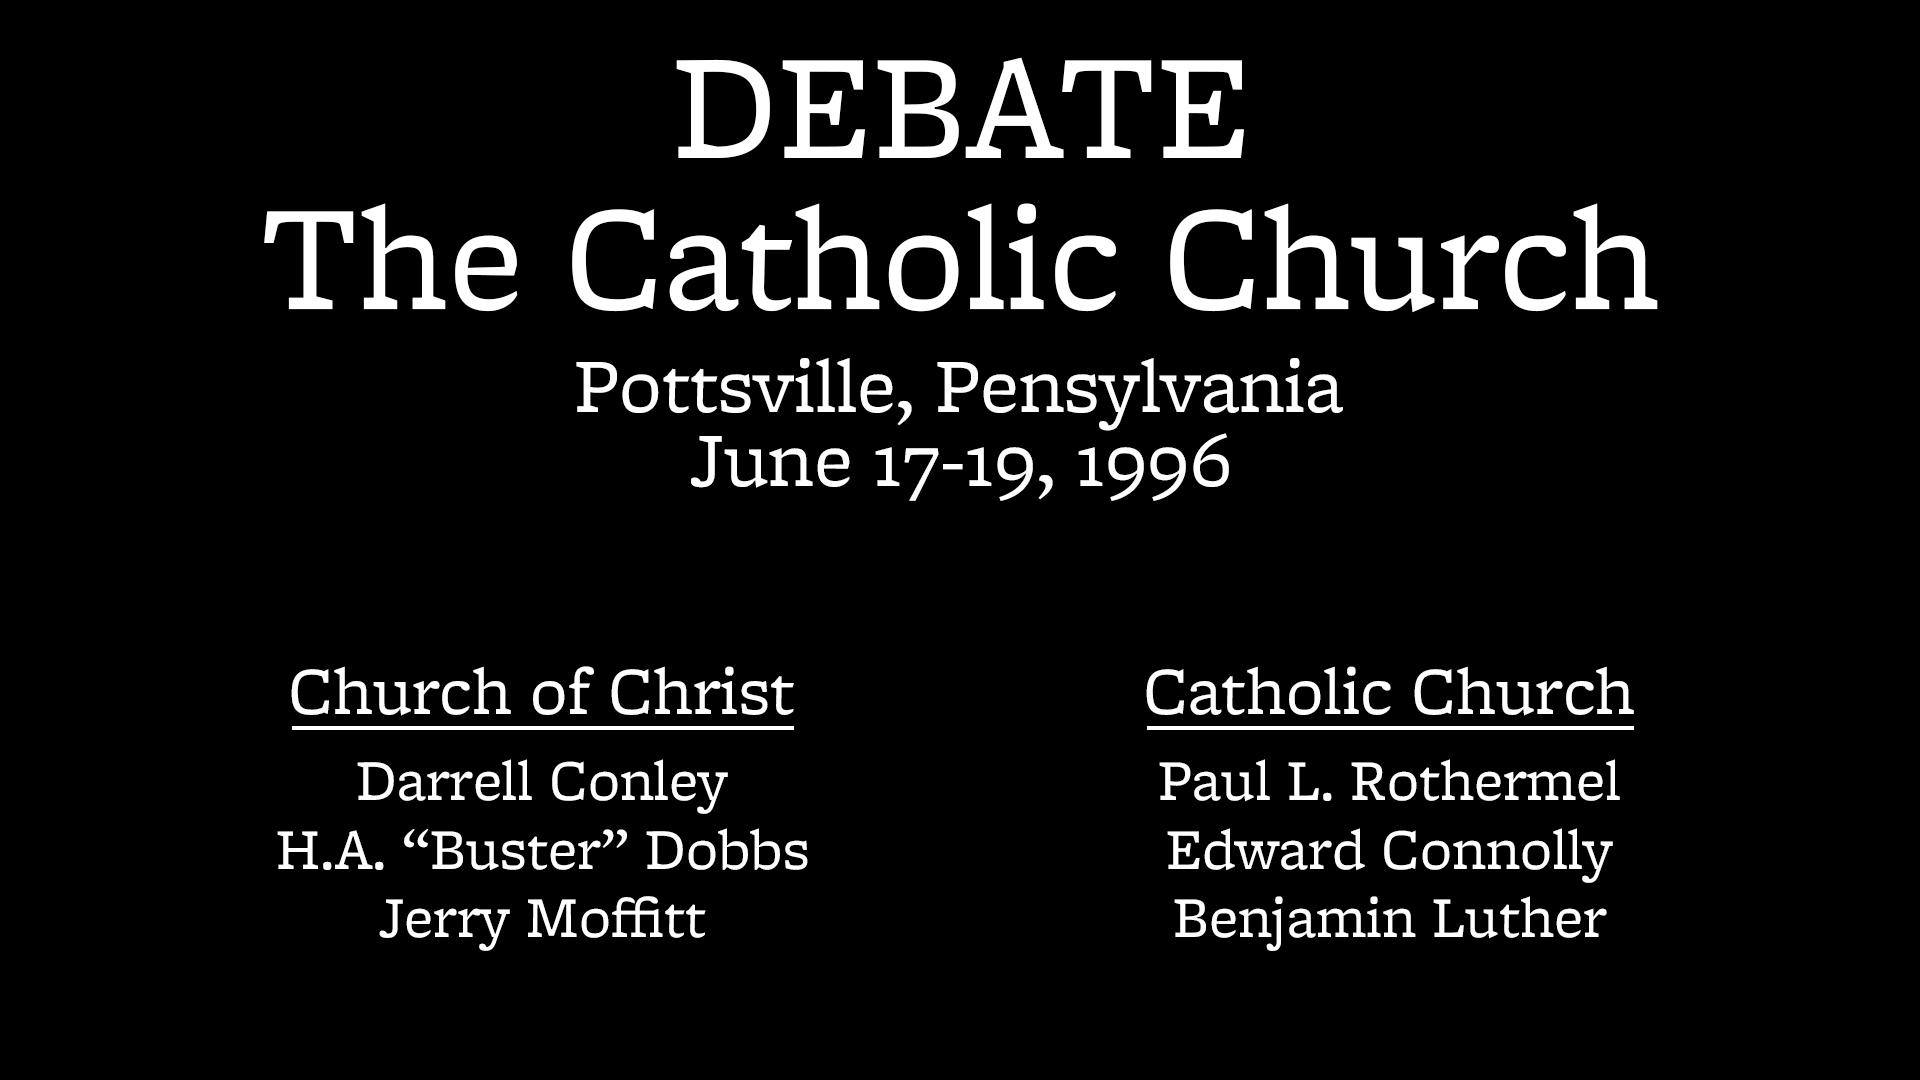 Debate on the Catholic Church (Pottsville, PA)